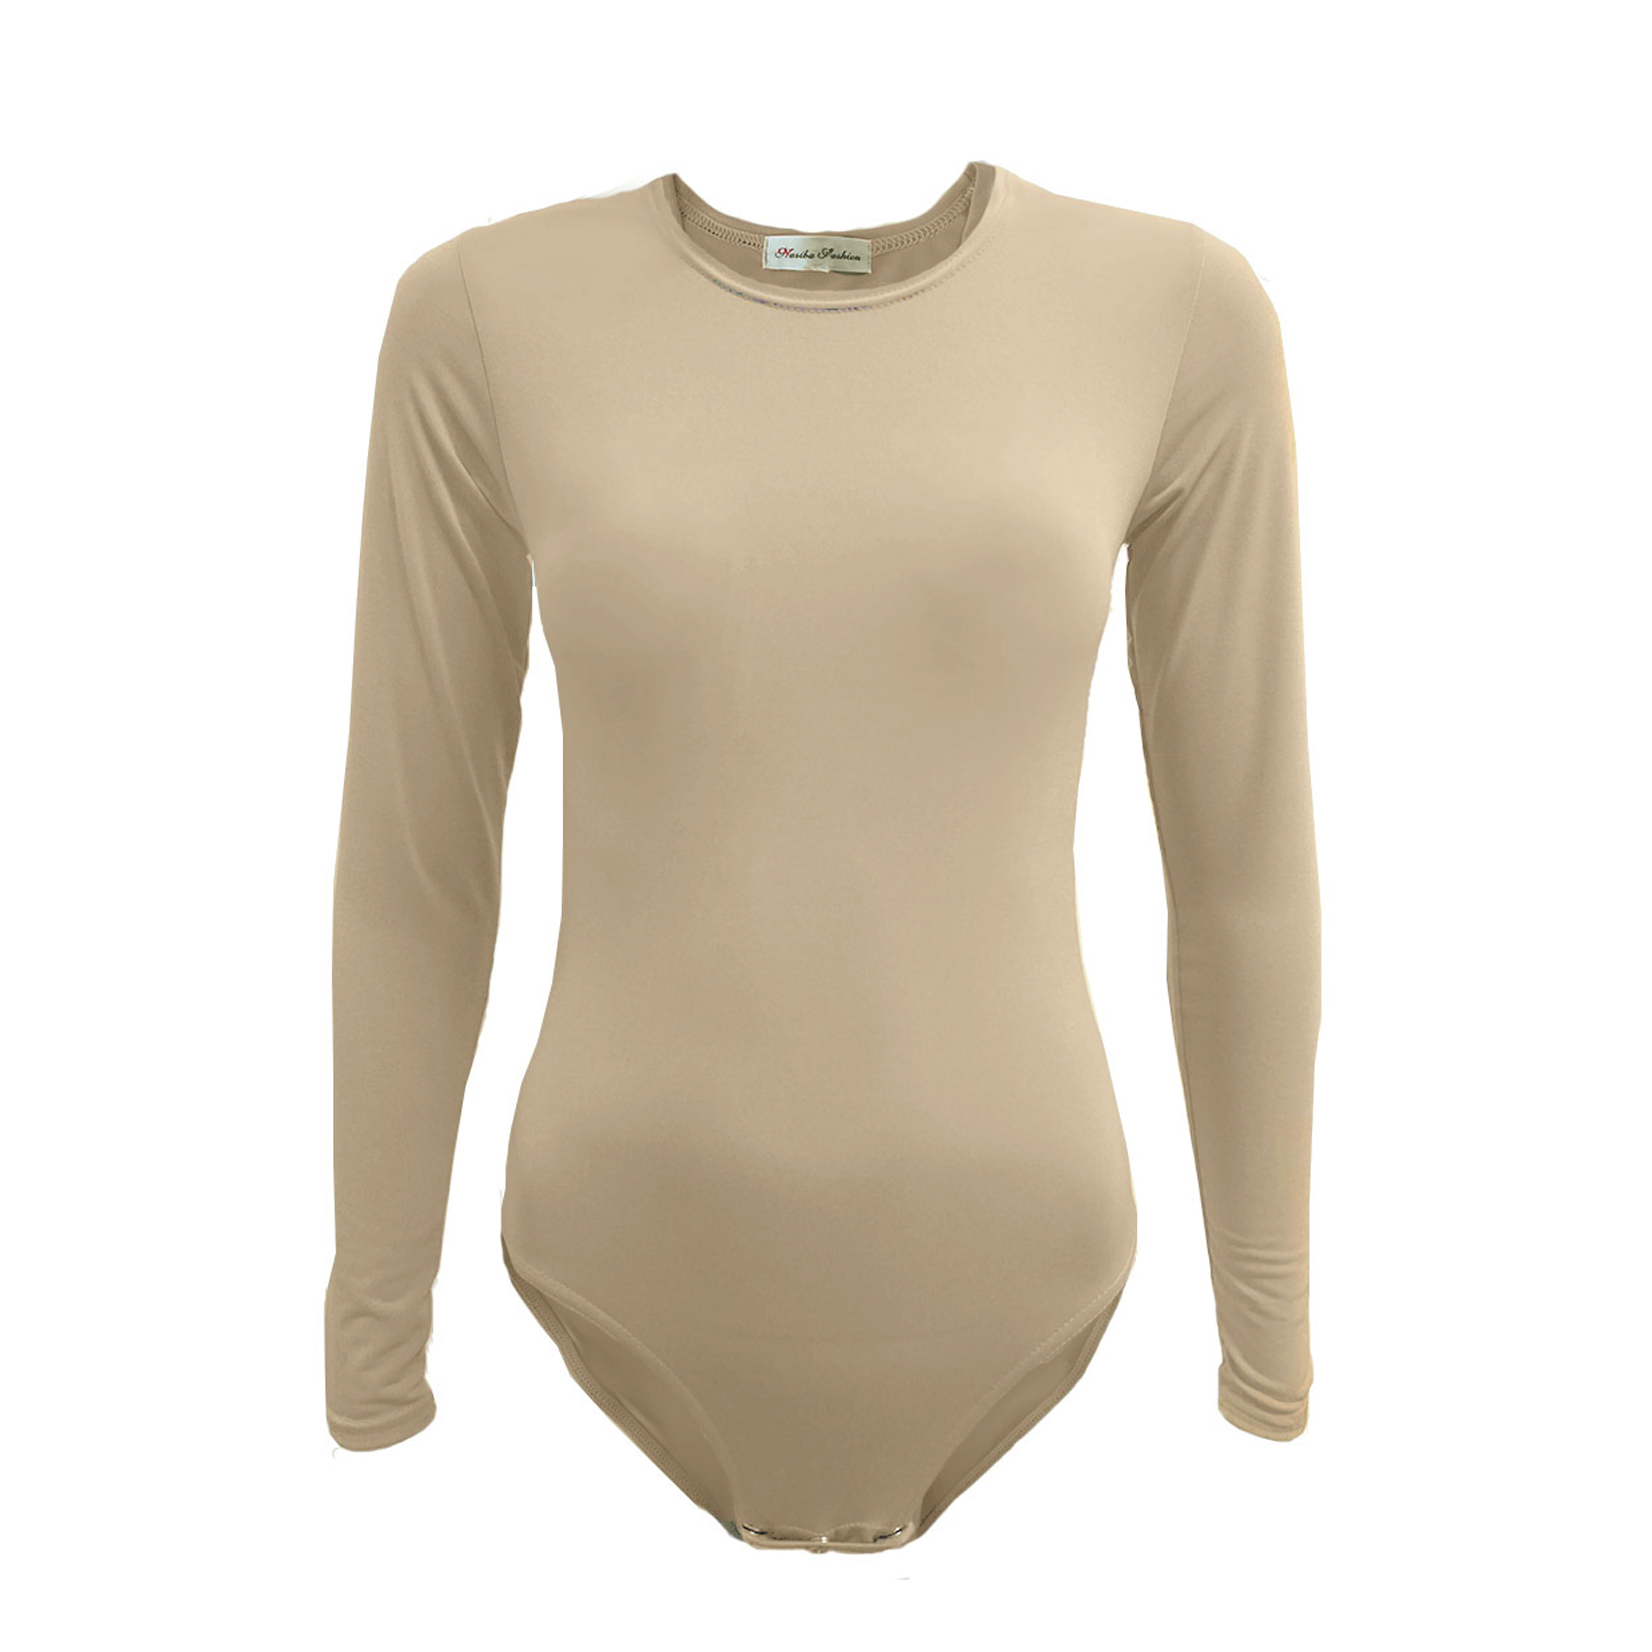 Nasiba Fashion Nude Bodysuit